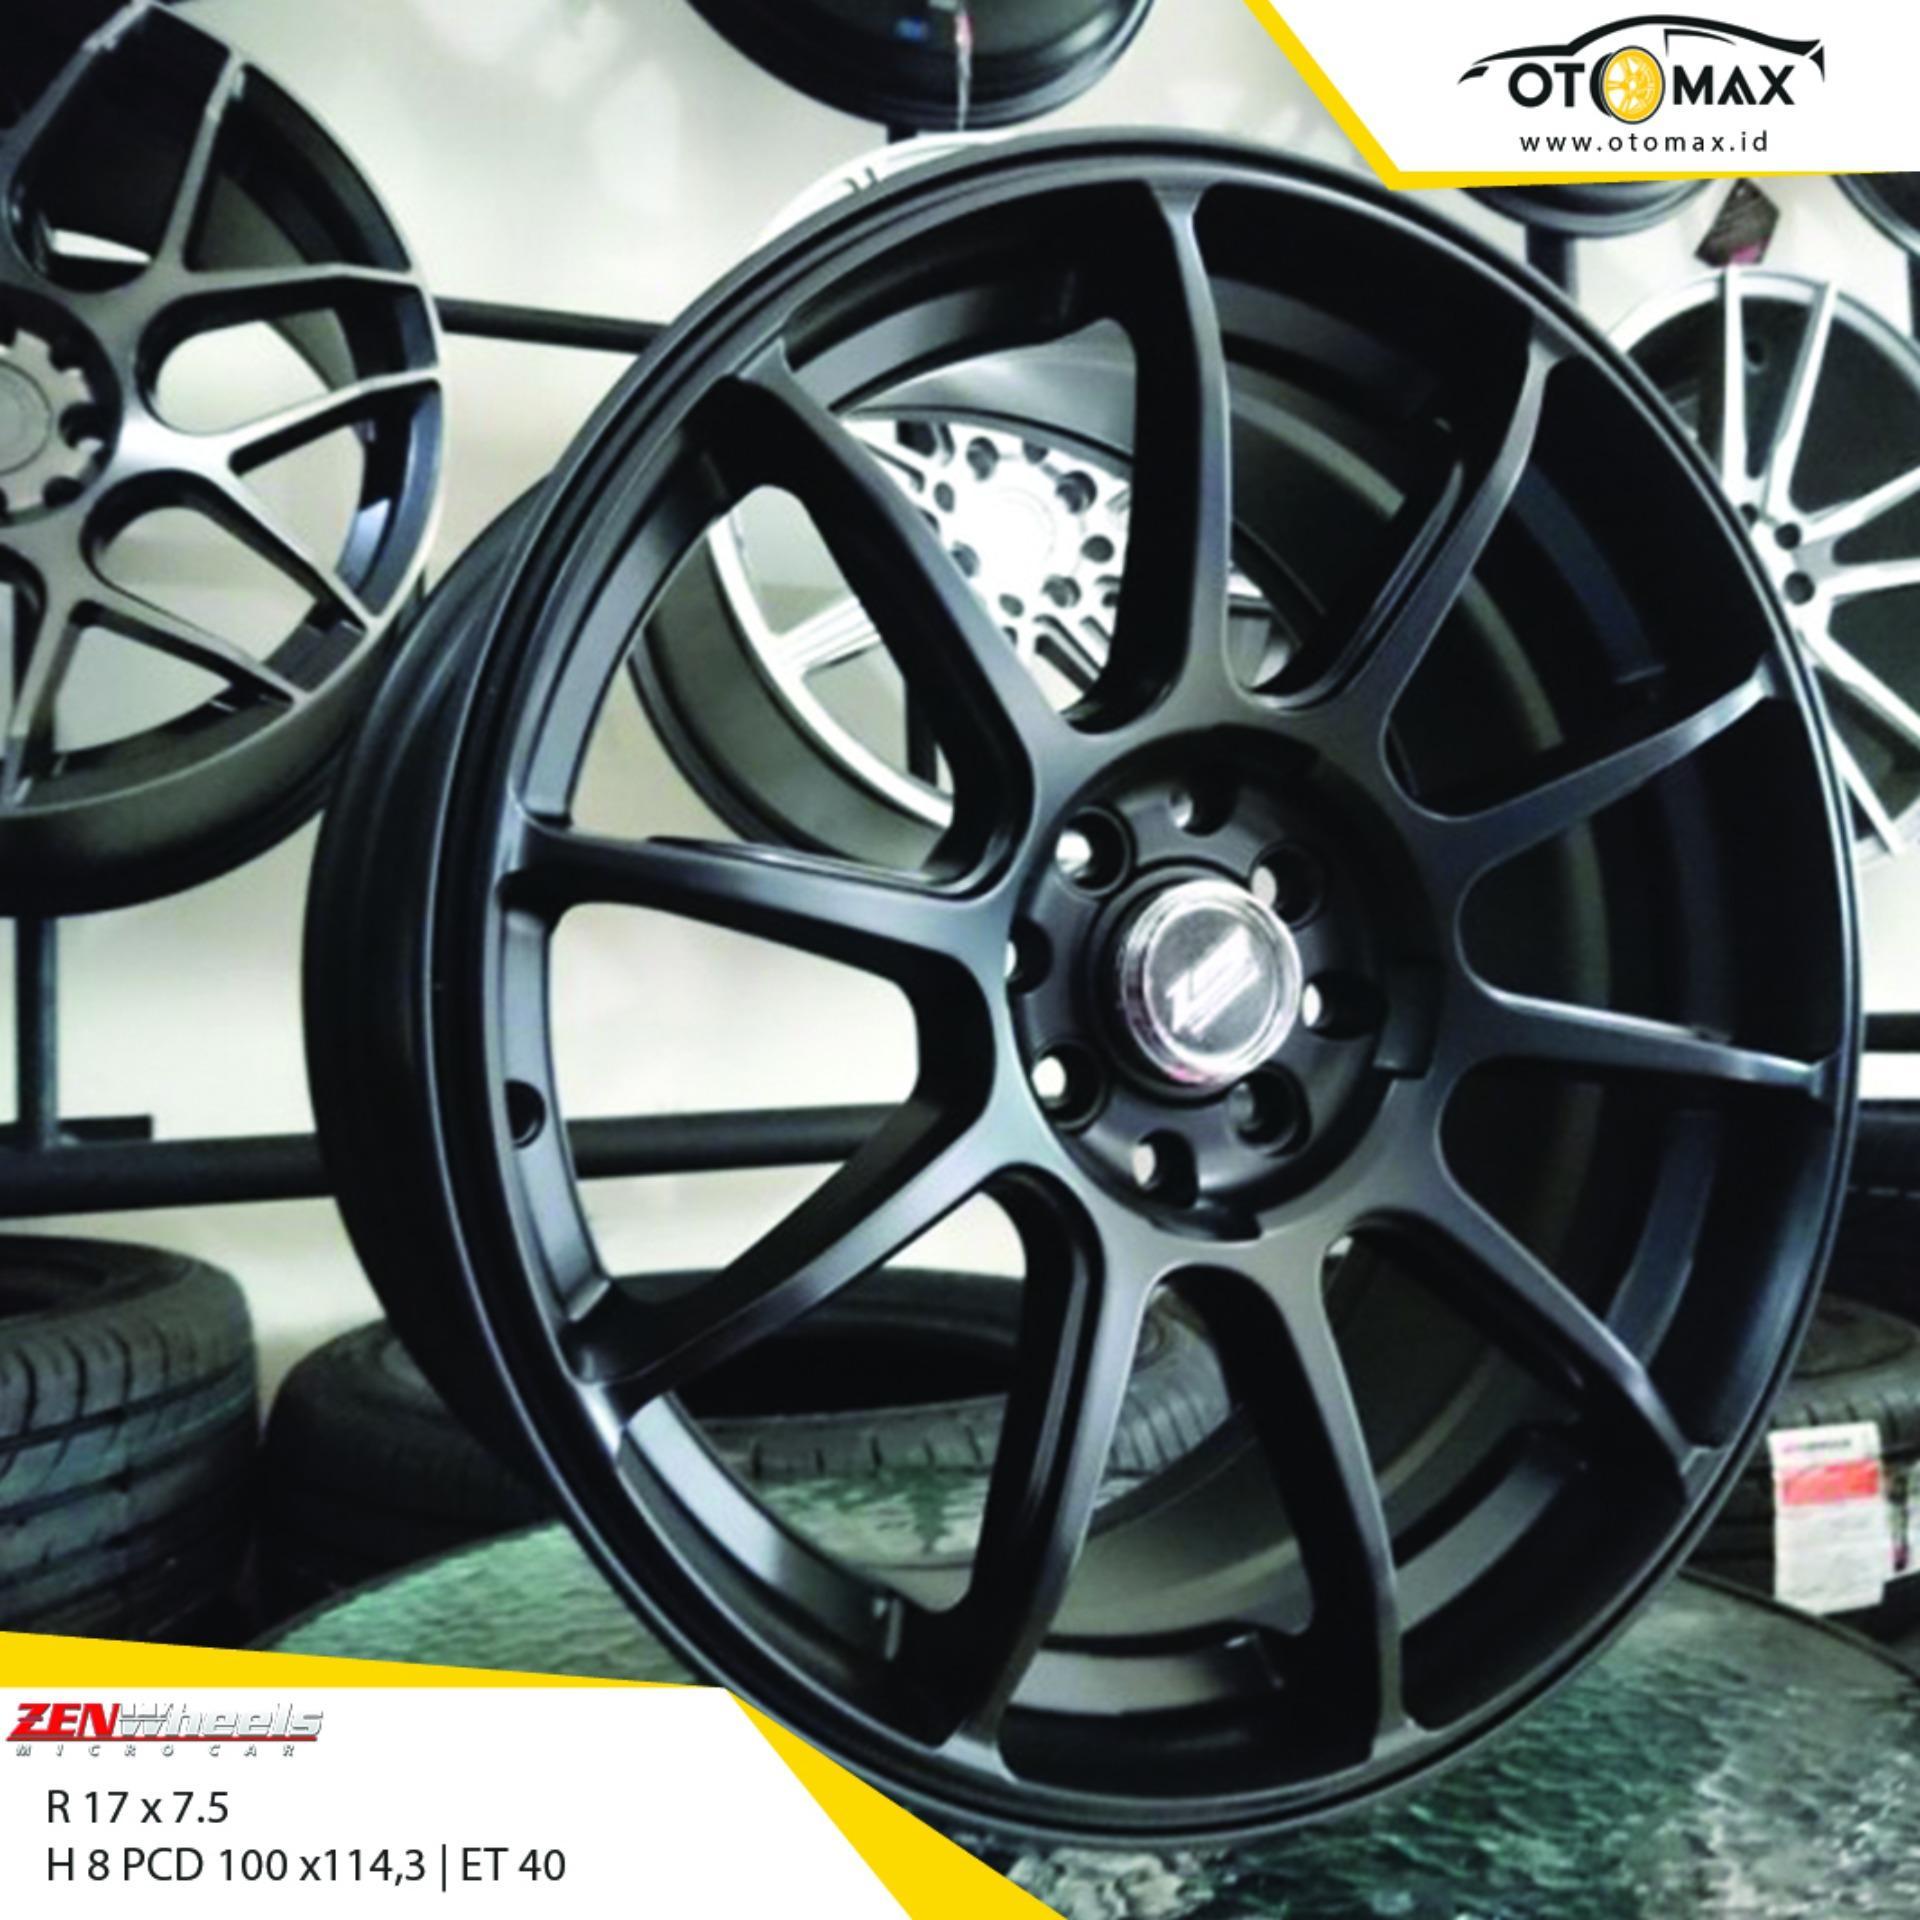 Harga Terendah Velg Mobil Zen 1069 Ring 16 Pencari Wheel Protector Pelindung List Universal